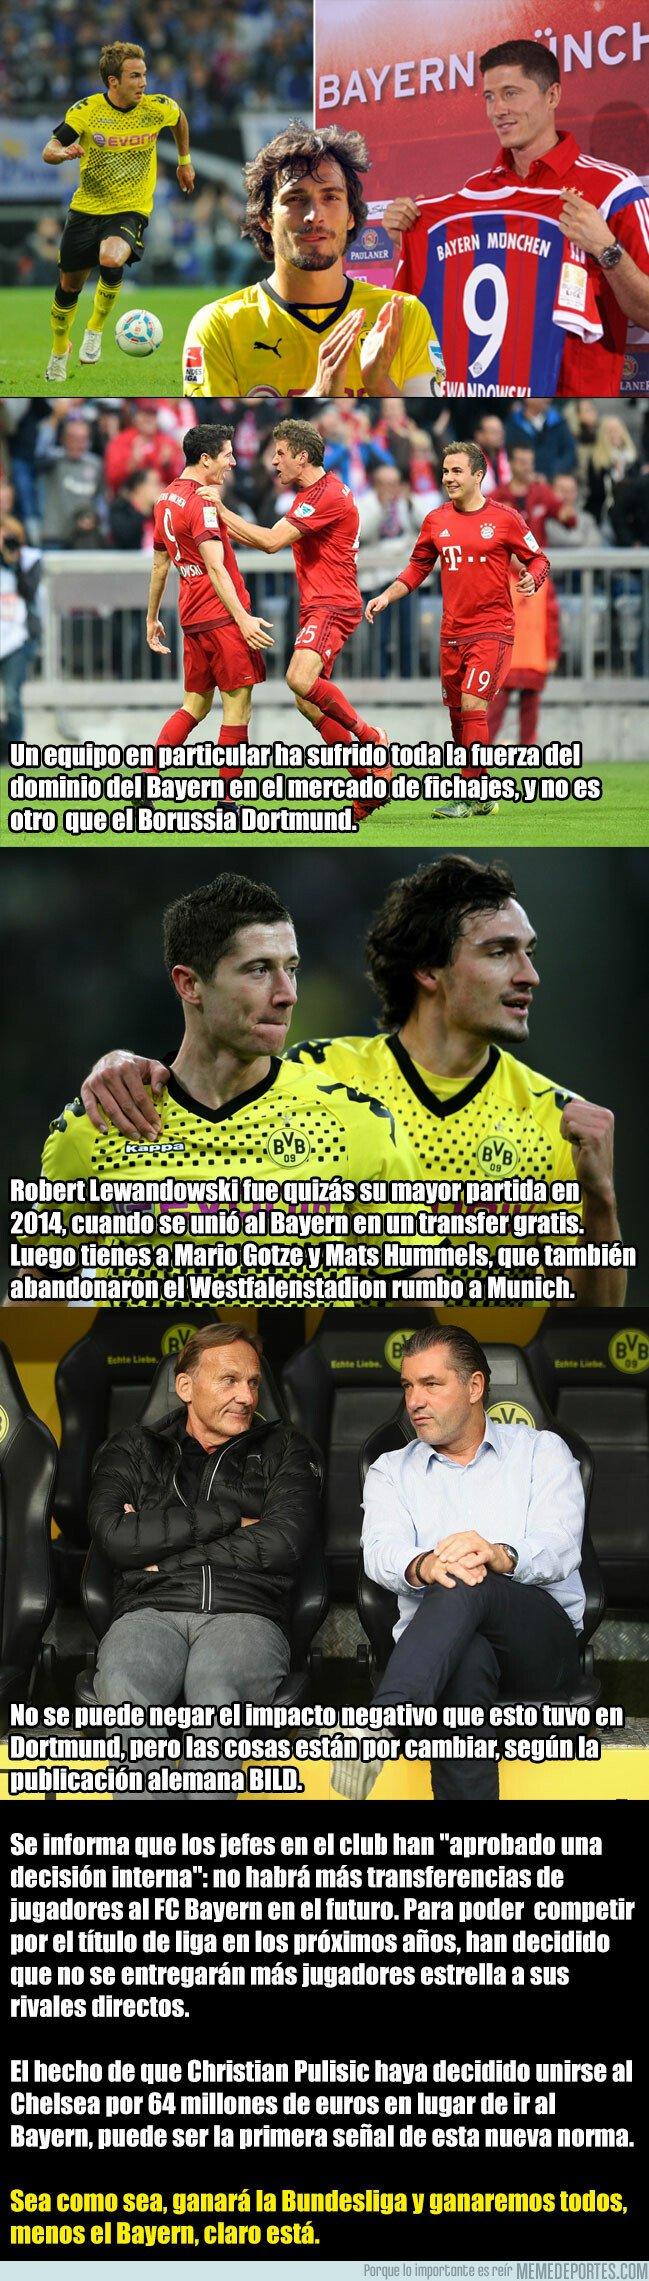 1061701 - El Bayern Munich ya no podrá fichar a ningún jugador del Borussia Dortmund